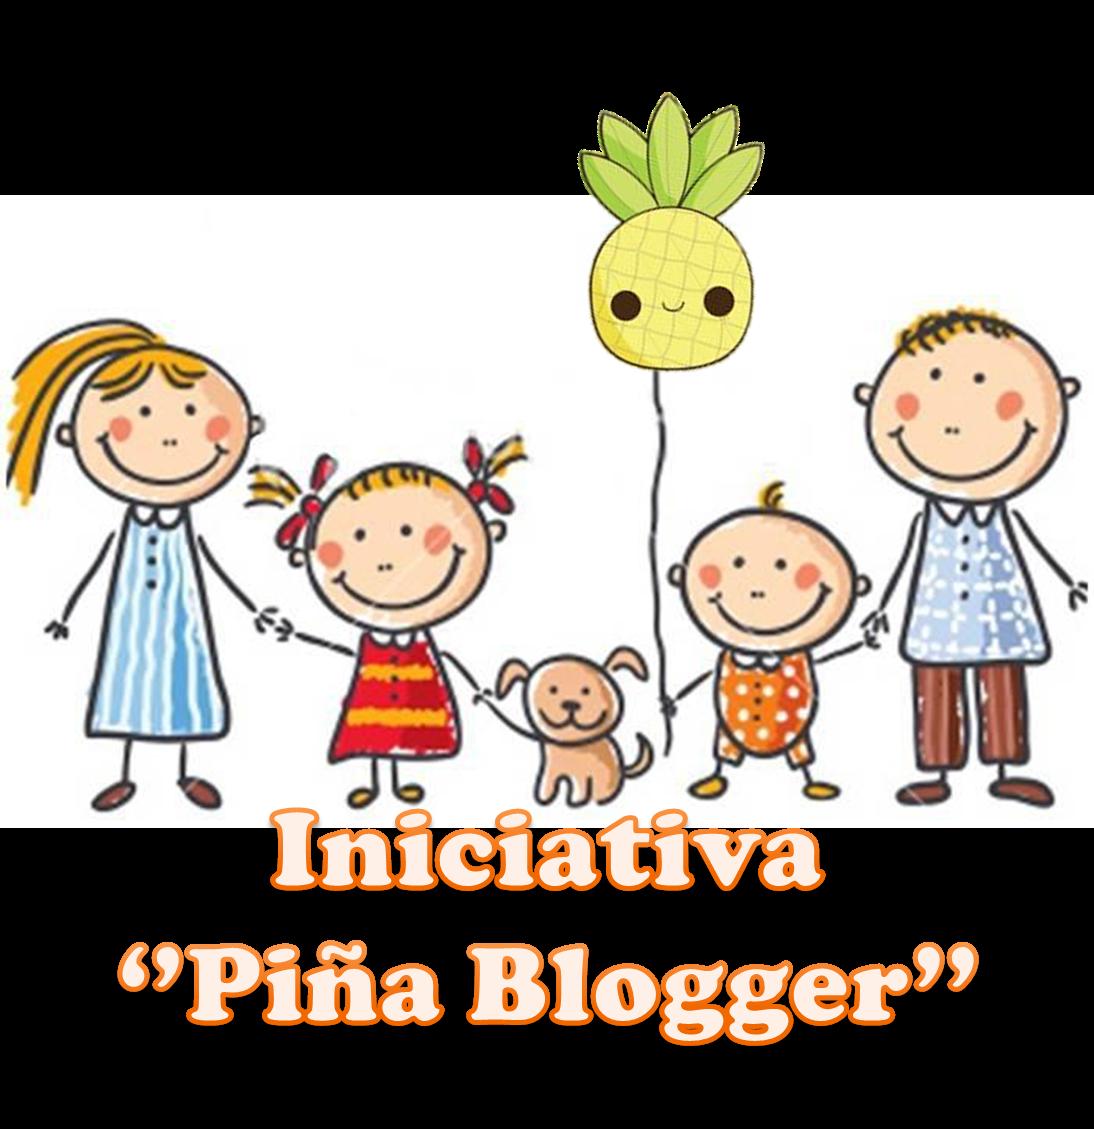 Iniciativa ''Piña Blogger''